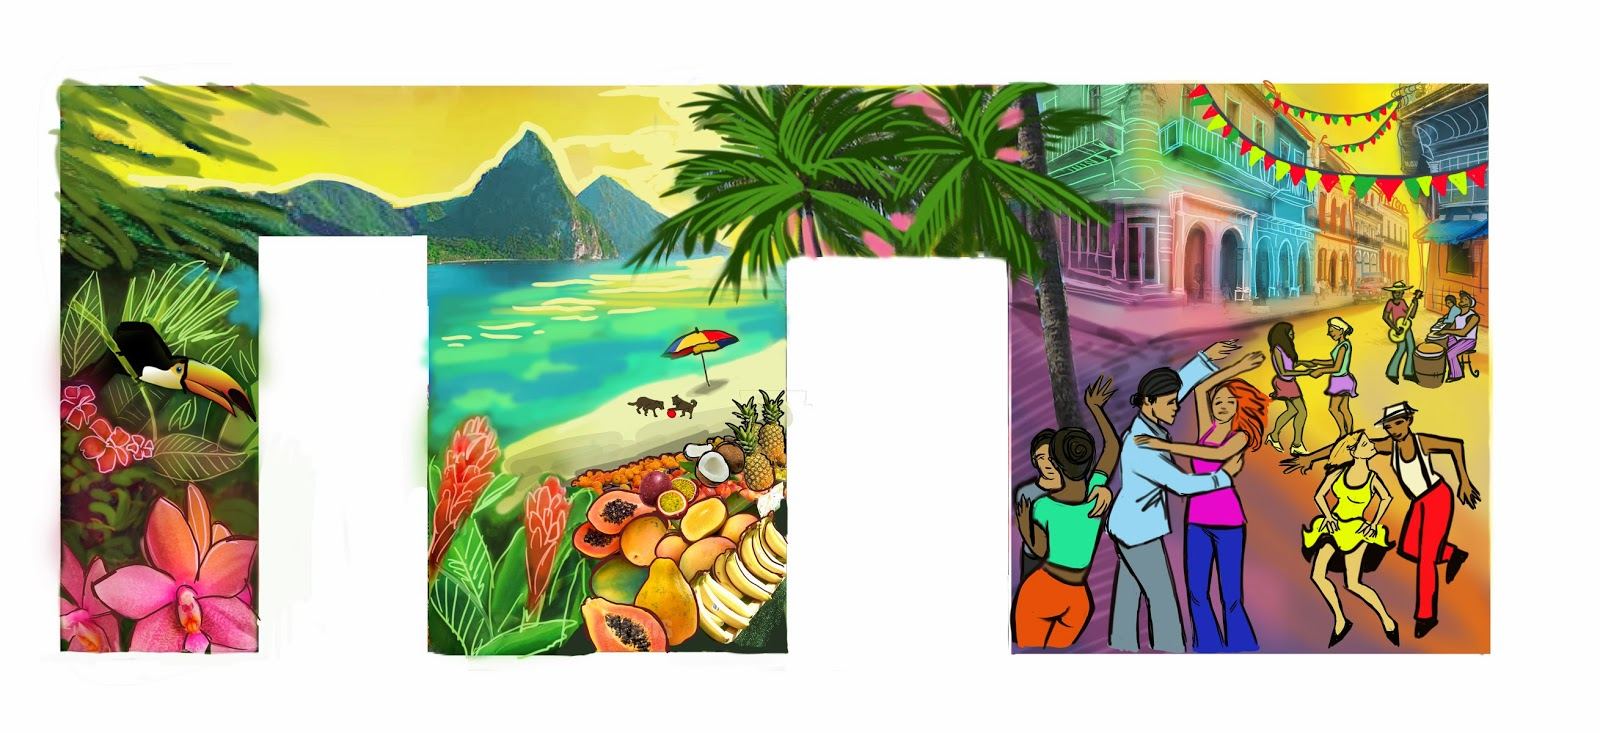 latin dance mural, cuba salsa mural, dance party mural, latin beach mural